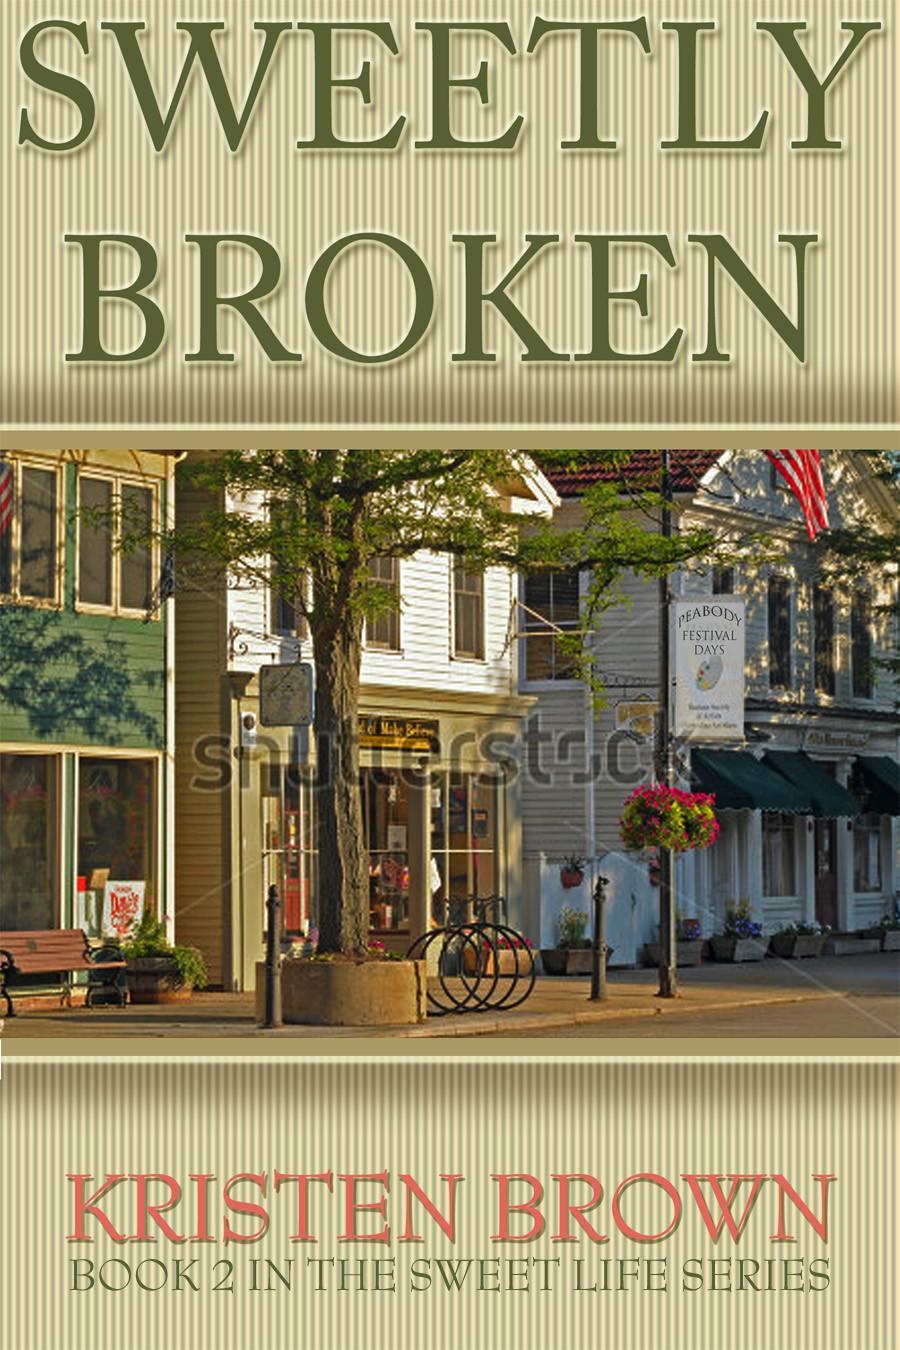 Create the next book or magazine design for Kristen Brown